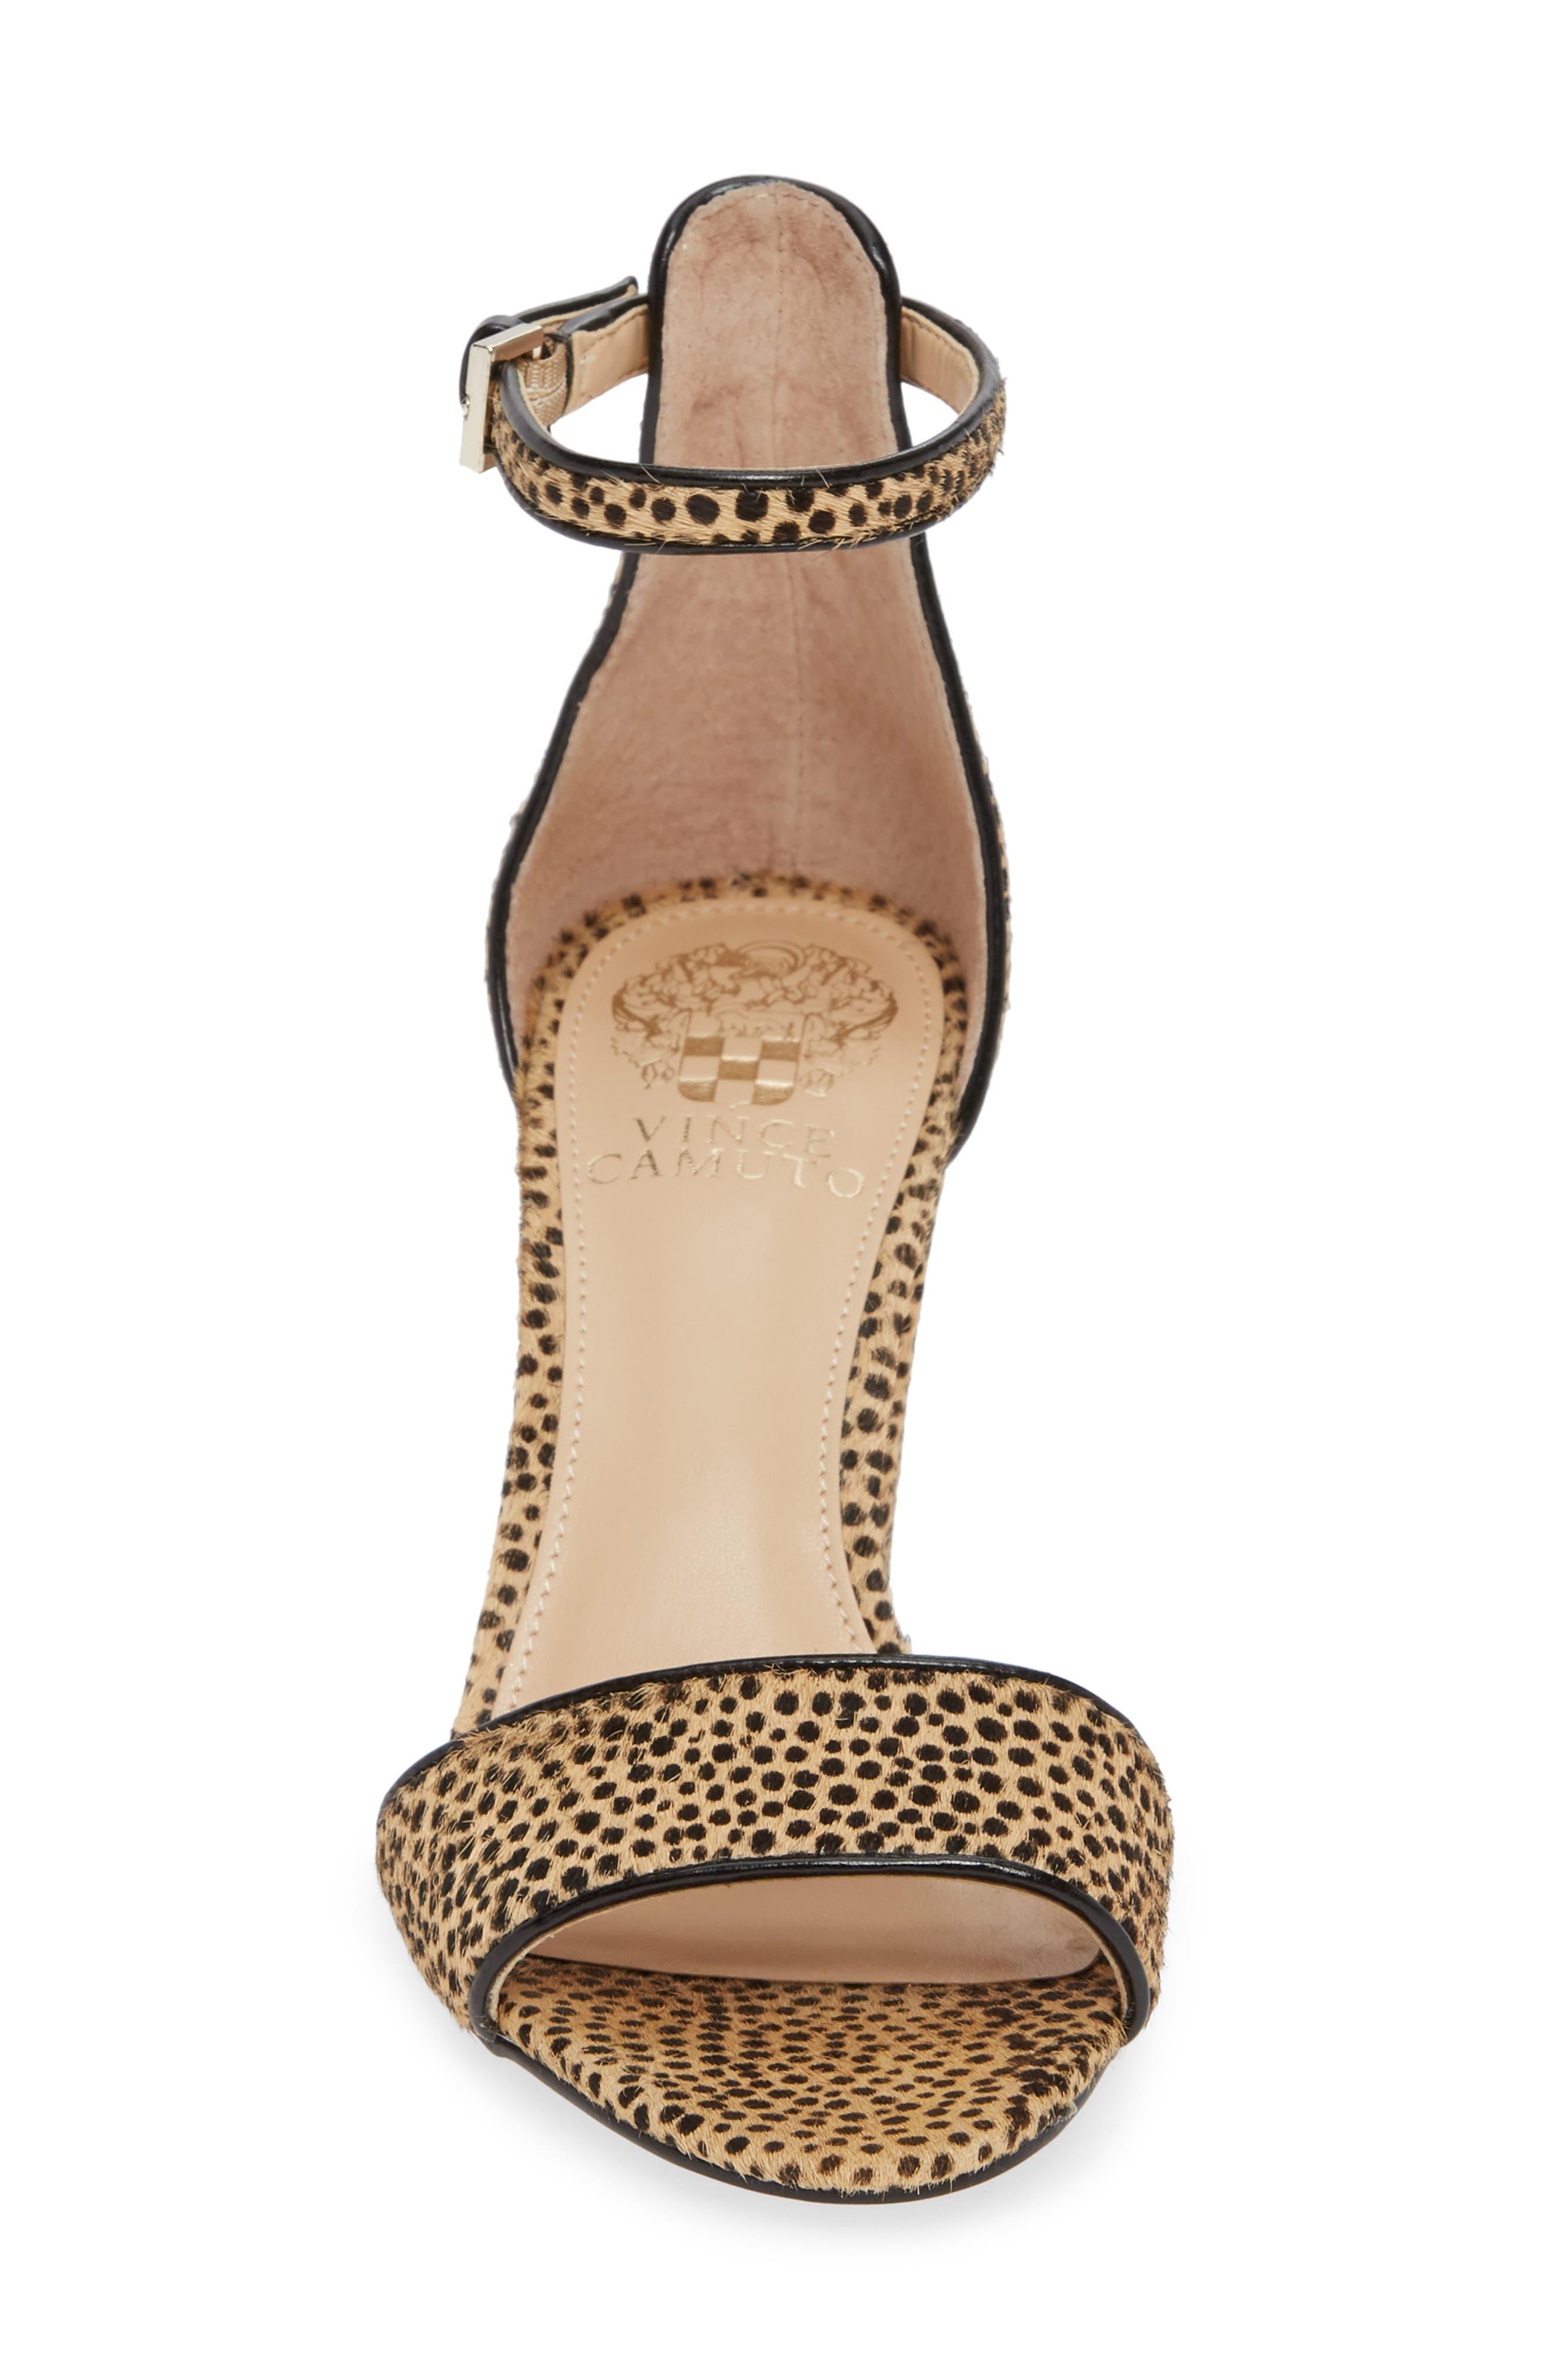 Corlina Genuine Calf Hair Ankle Strap Sandal,                             Alternate thumbnail 4, color,                             NATURAL SPOTTED CALF HAIR